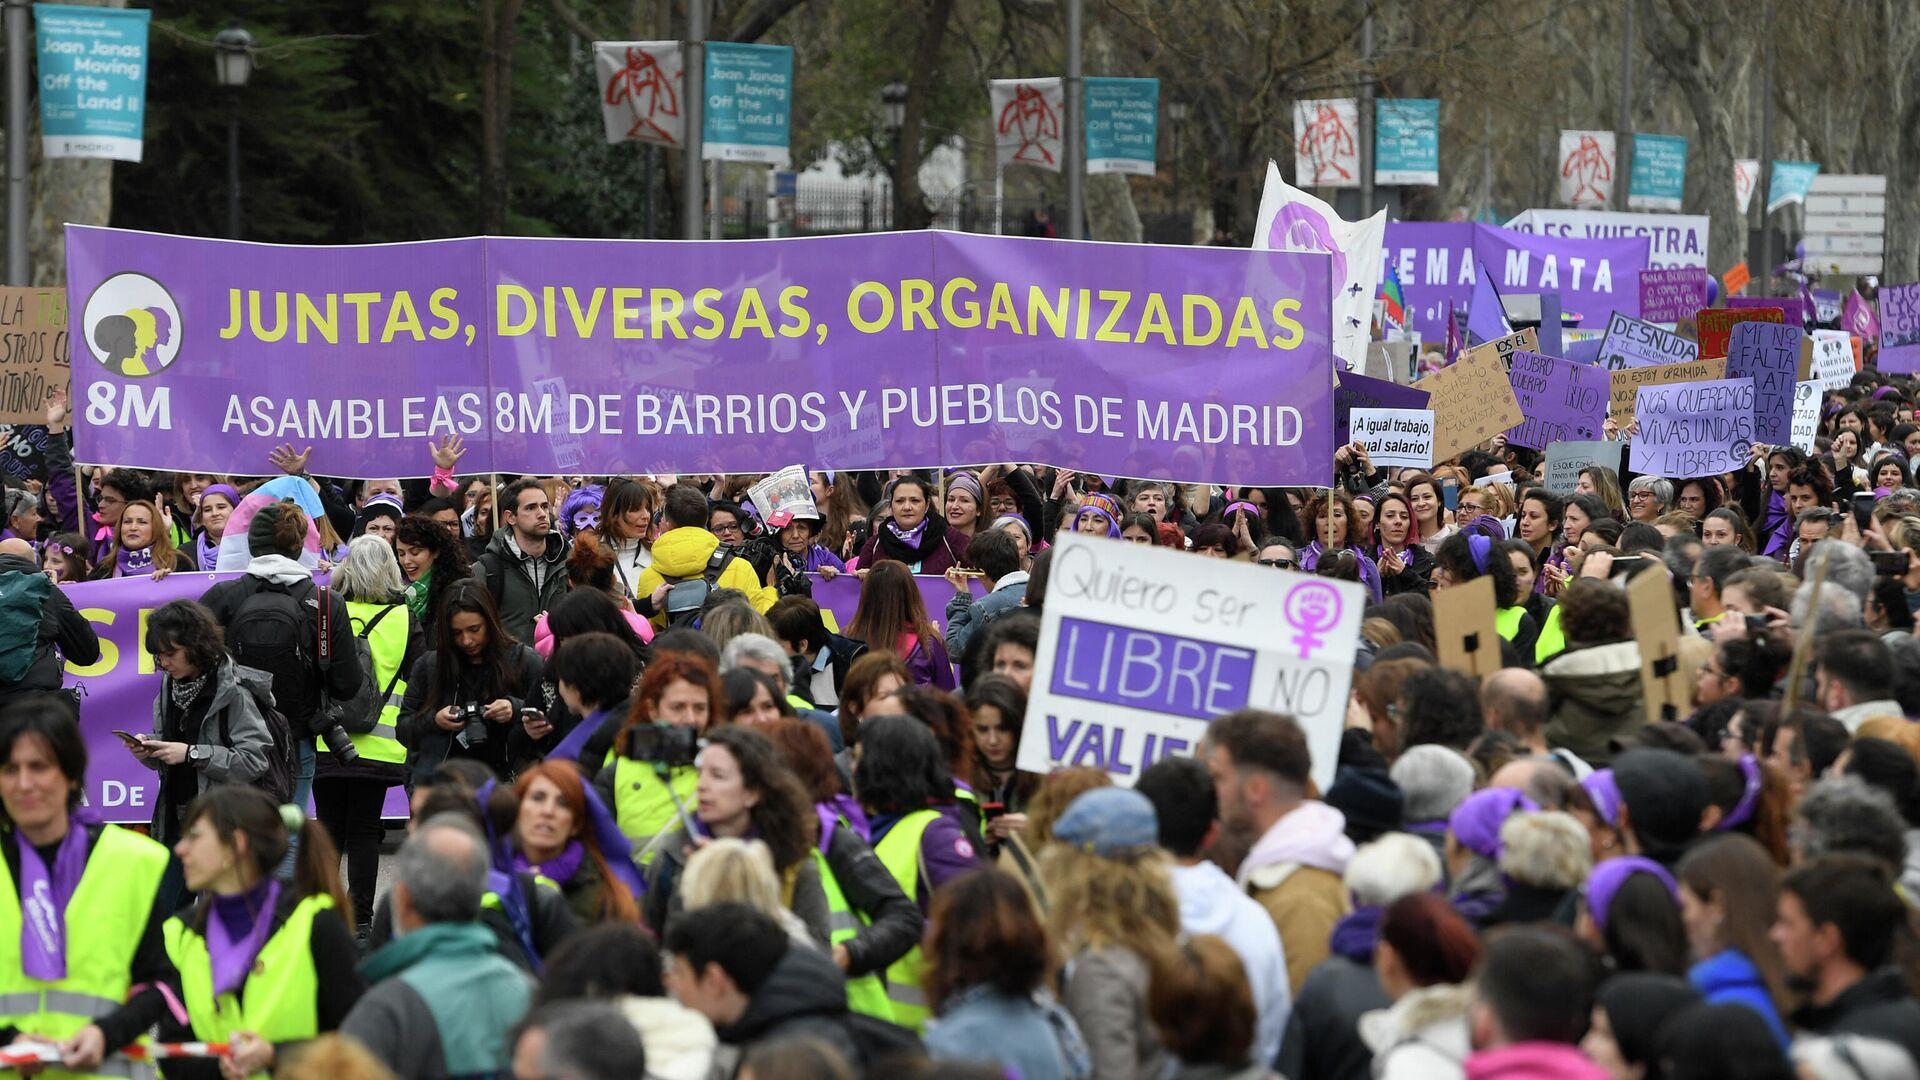 Manifestación del 8M en Madrid - Sputnik Mundo, 1920, 08.03.2021